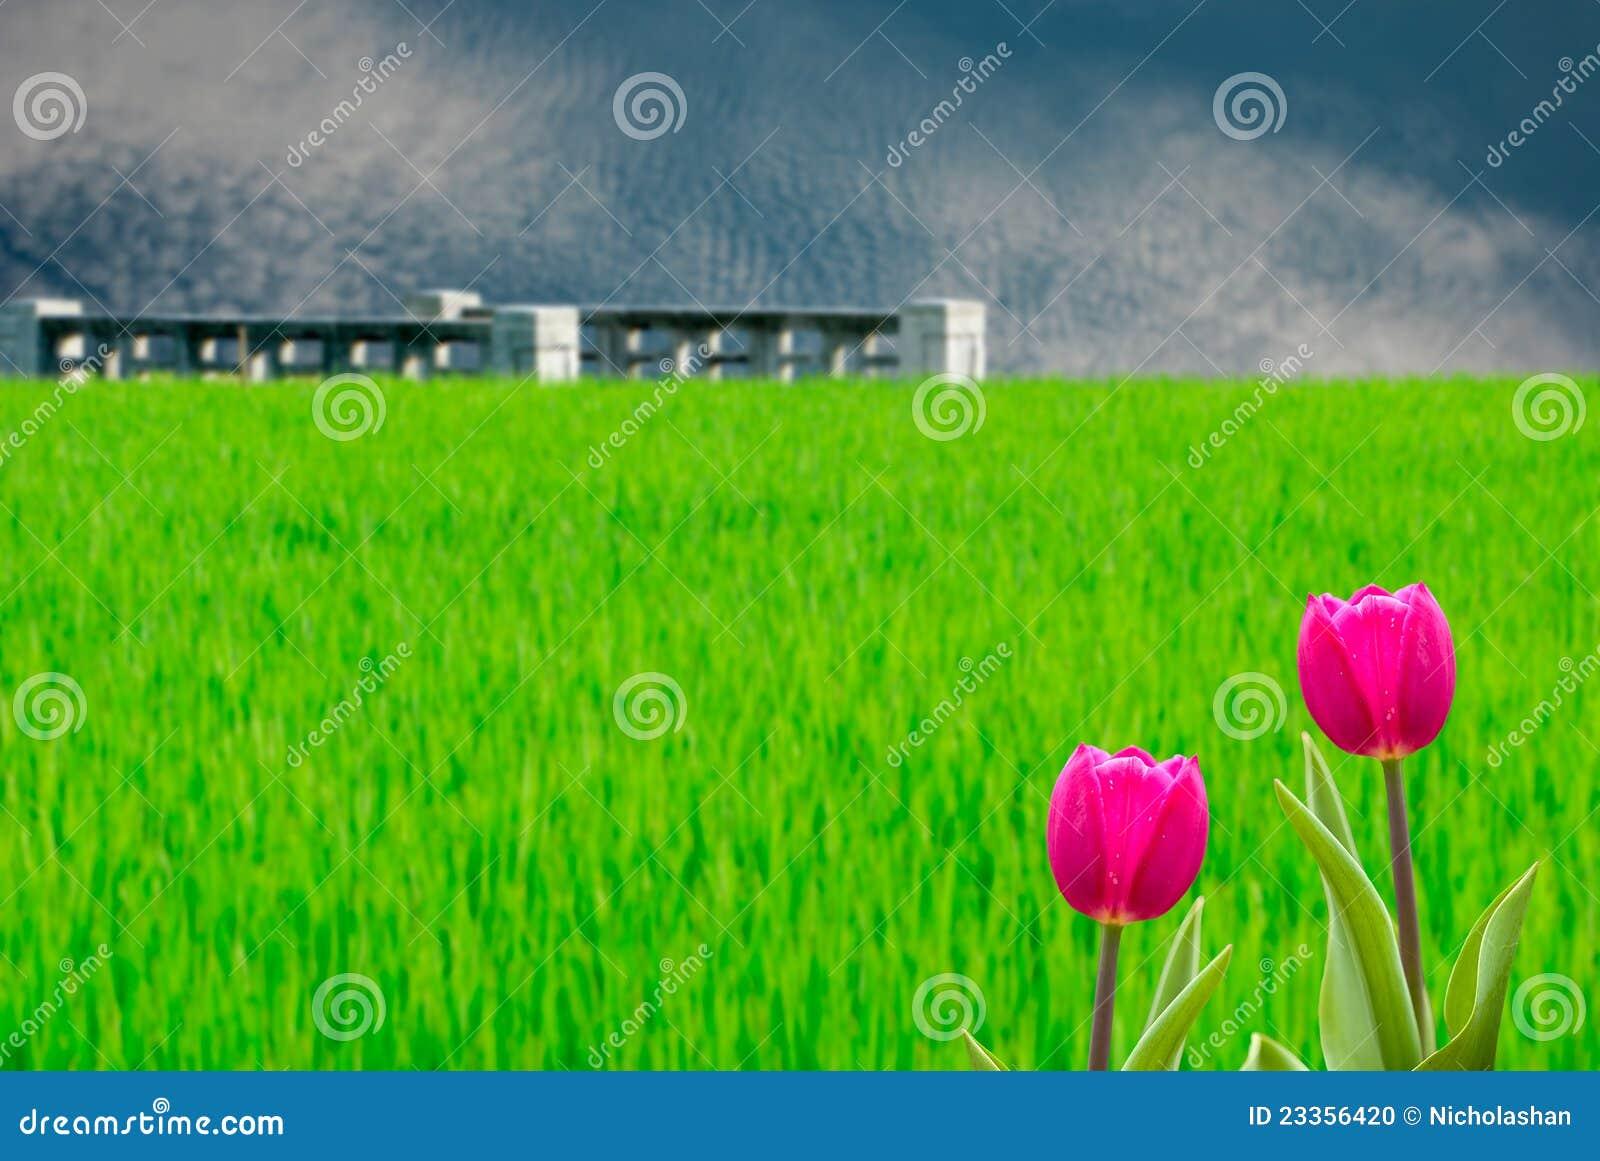 Fresh Spring Tulips With Nice BG Stock Photo